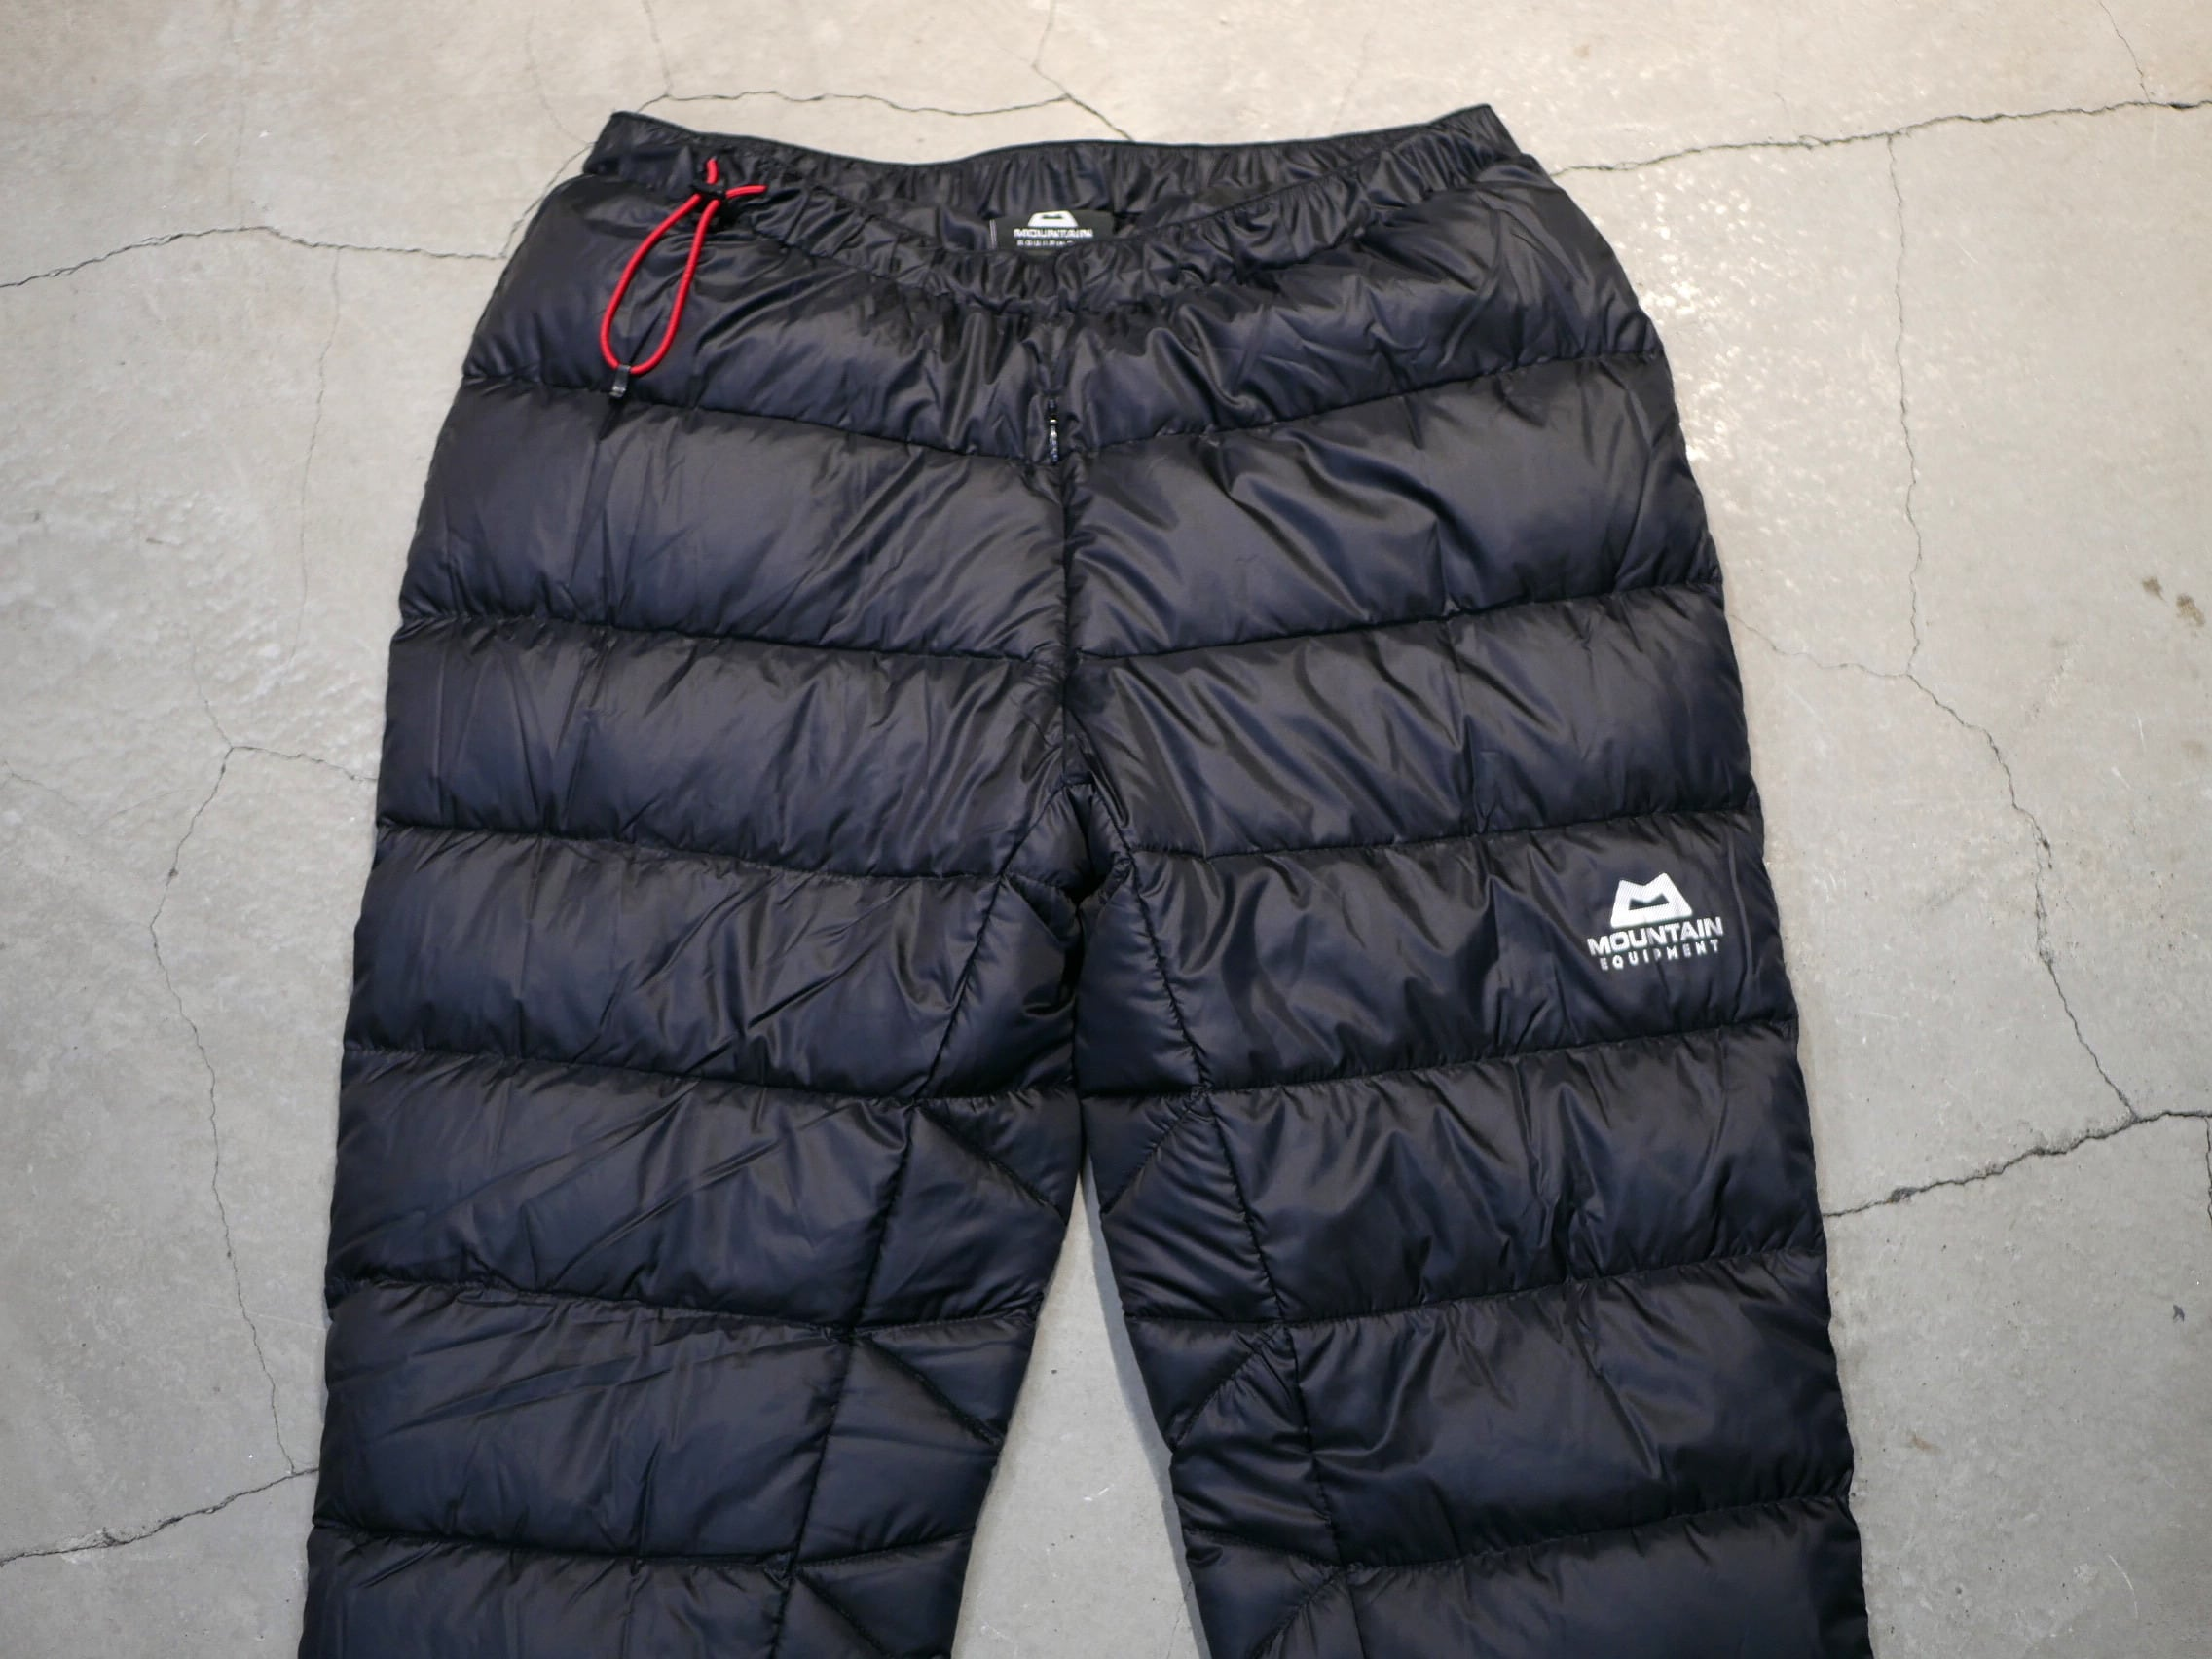 MOUNTAIN EQUIPMENT / POWDER PANTS